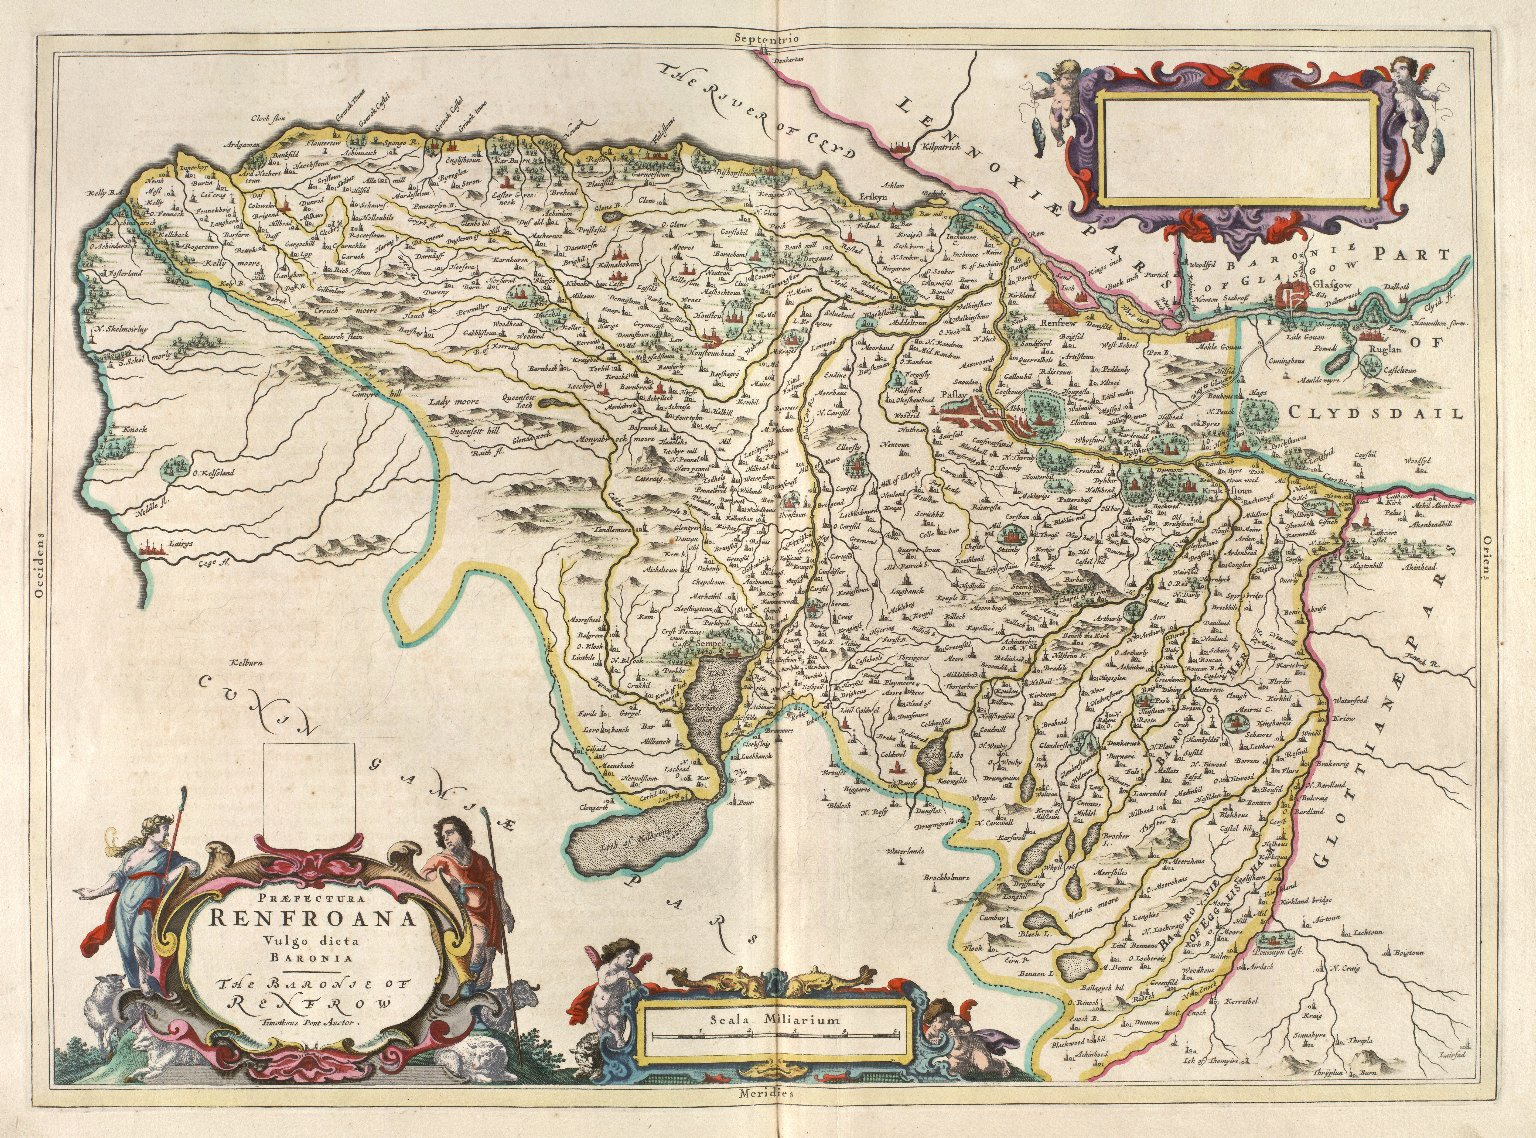 [Geographiae Blavianae] [Also known as: Atlas major] [078 of 153]